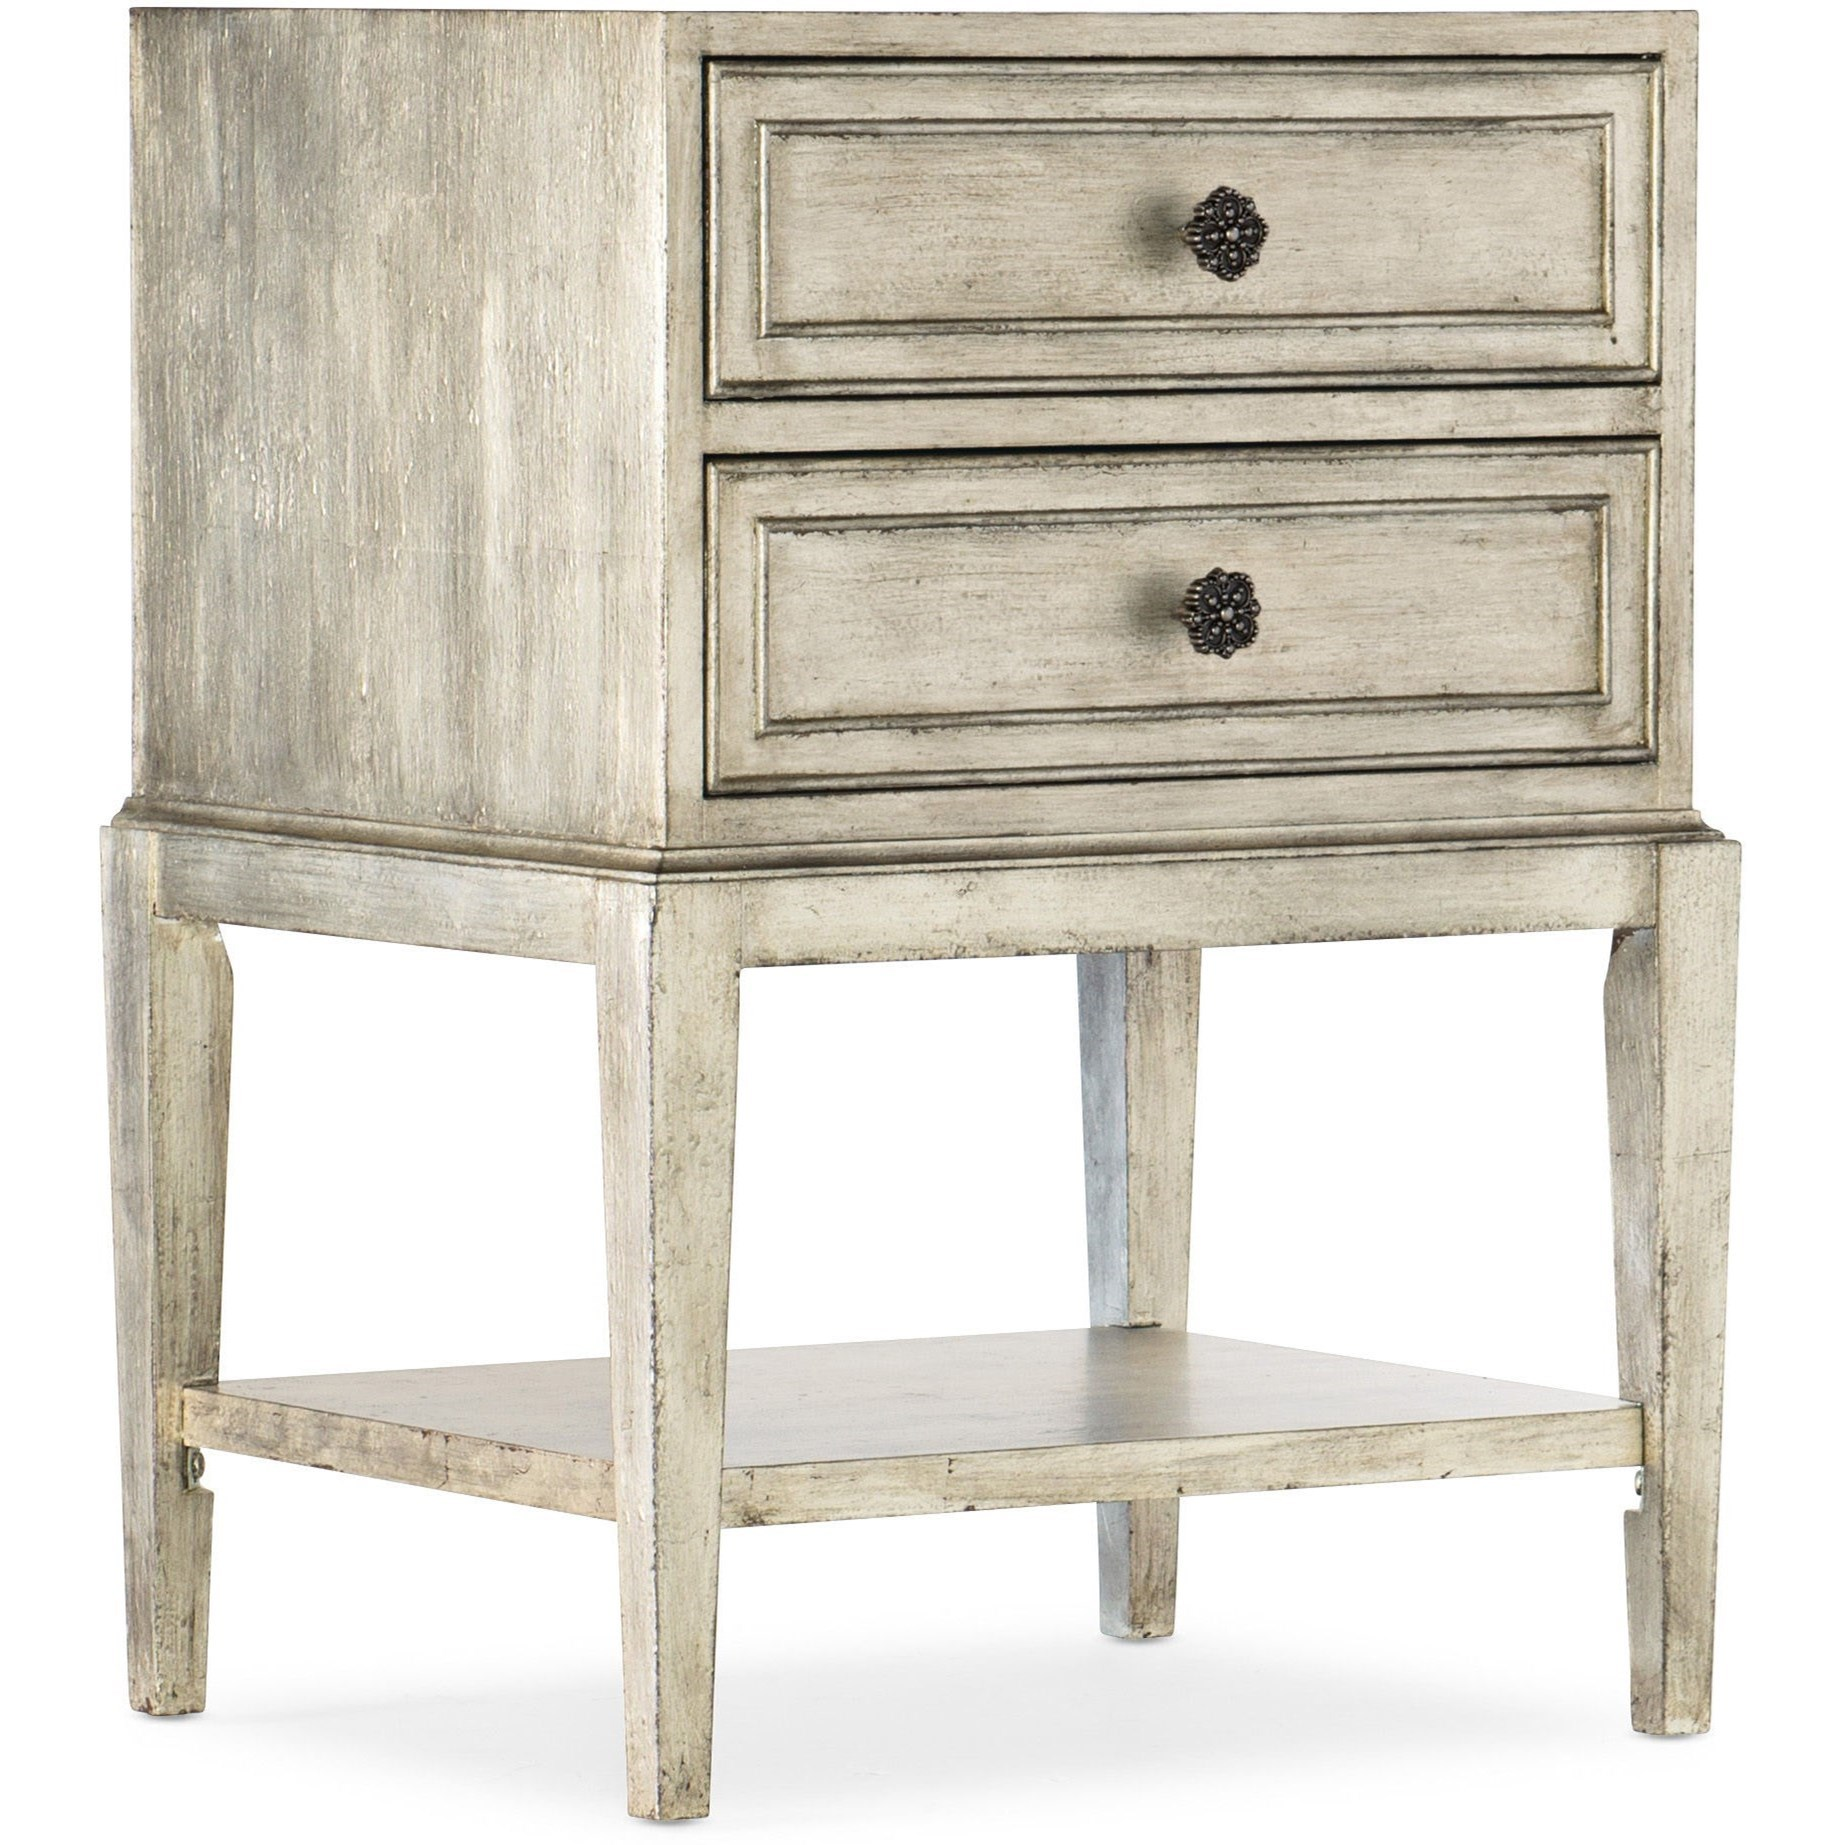 Sanctuary Petit Bijou Telephone Table by Hooker Furniture at Alison Craig Home Furnishings